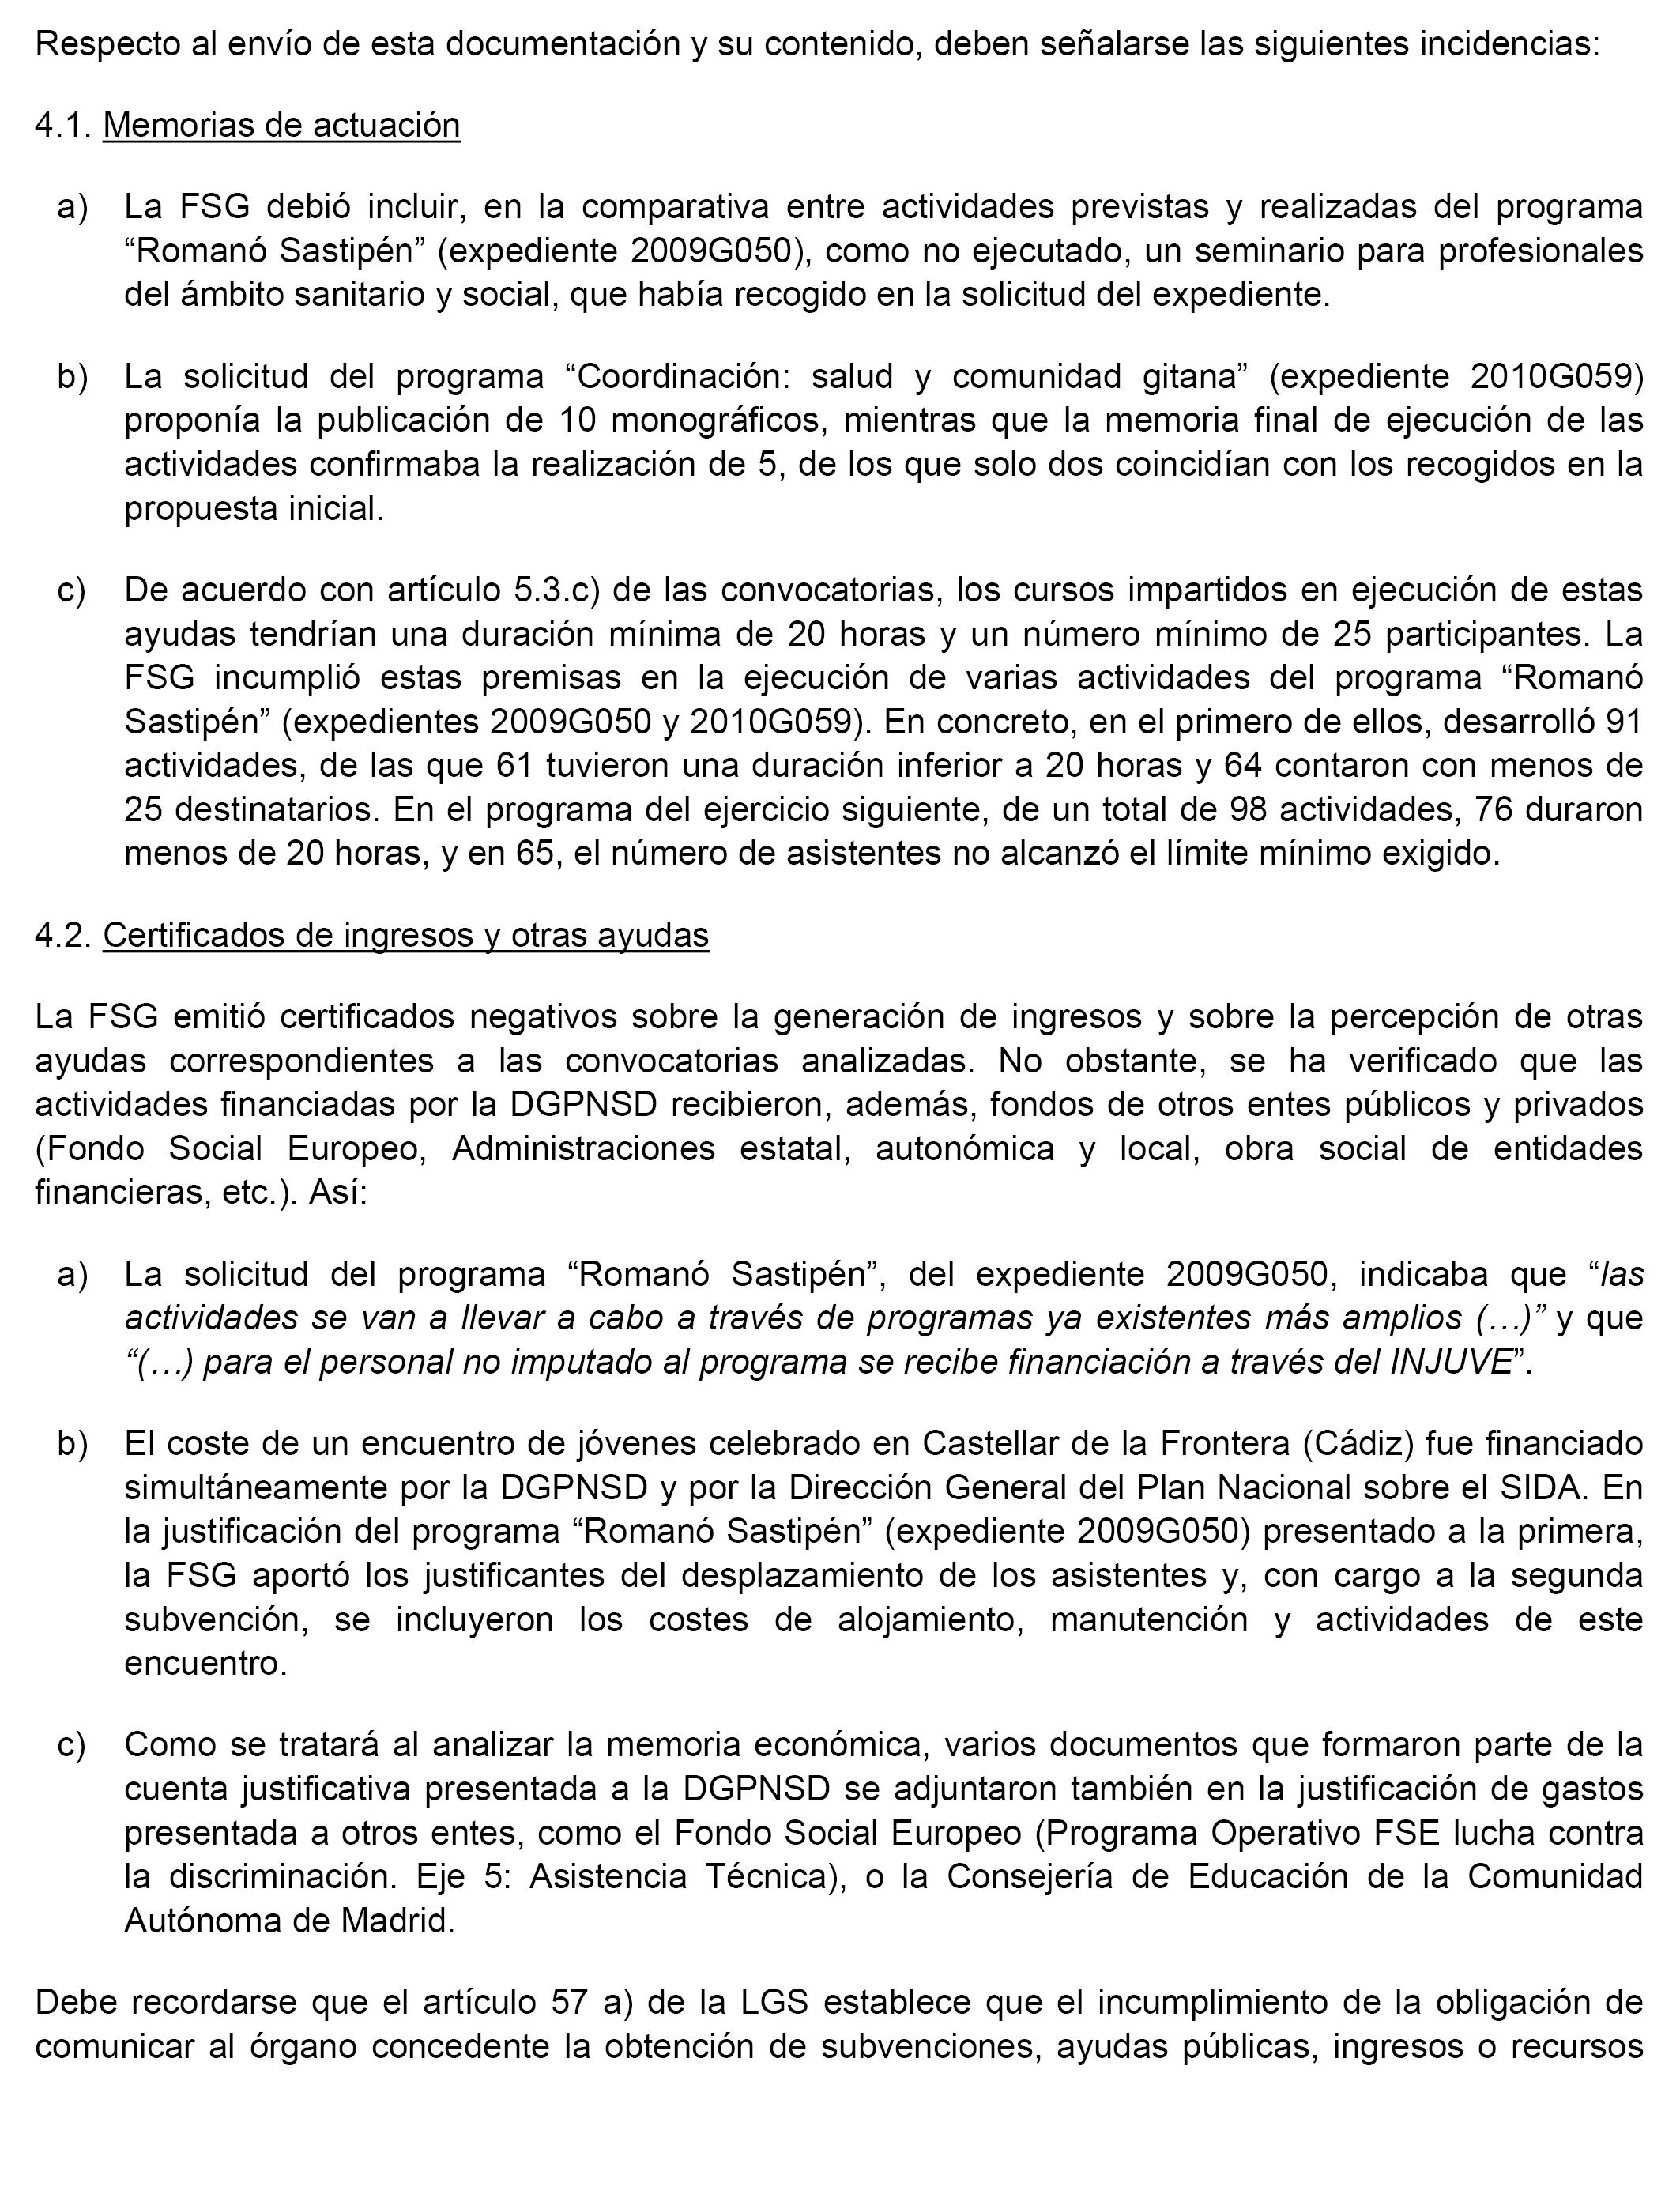 BOE.es - Documento BOE-A-2018-581